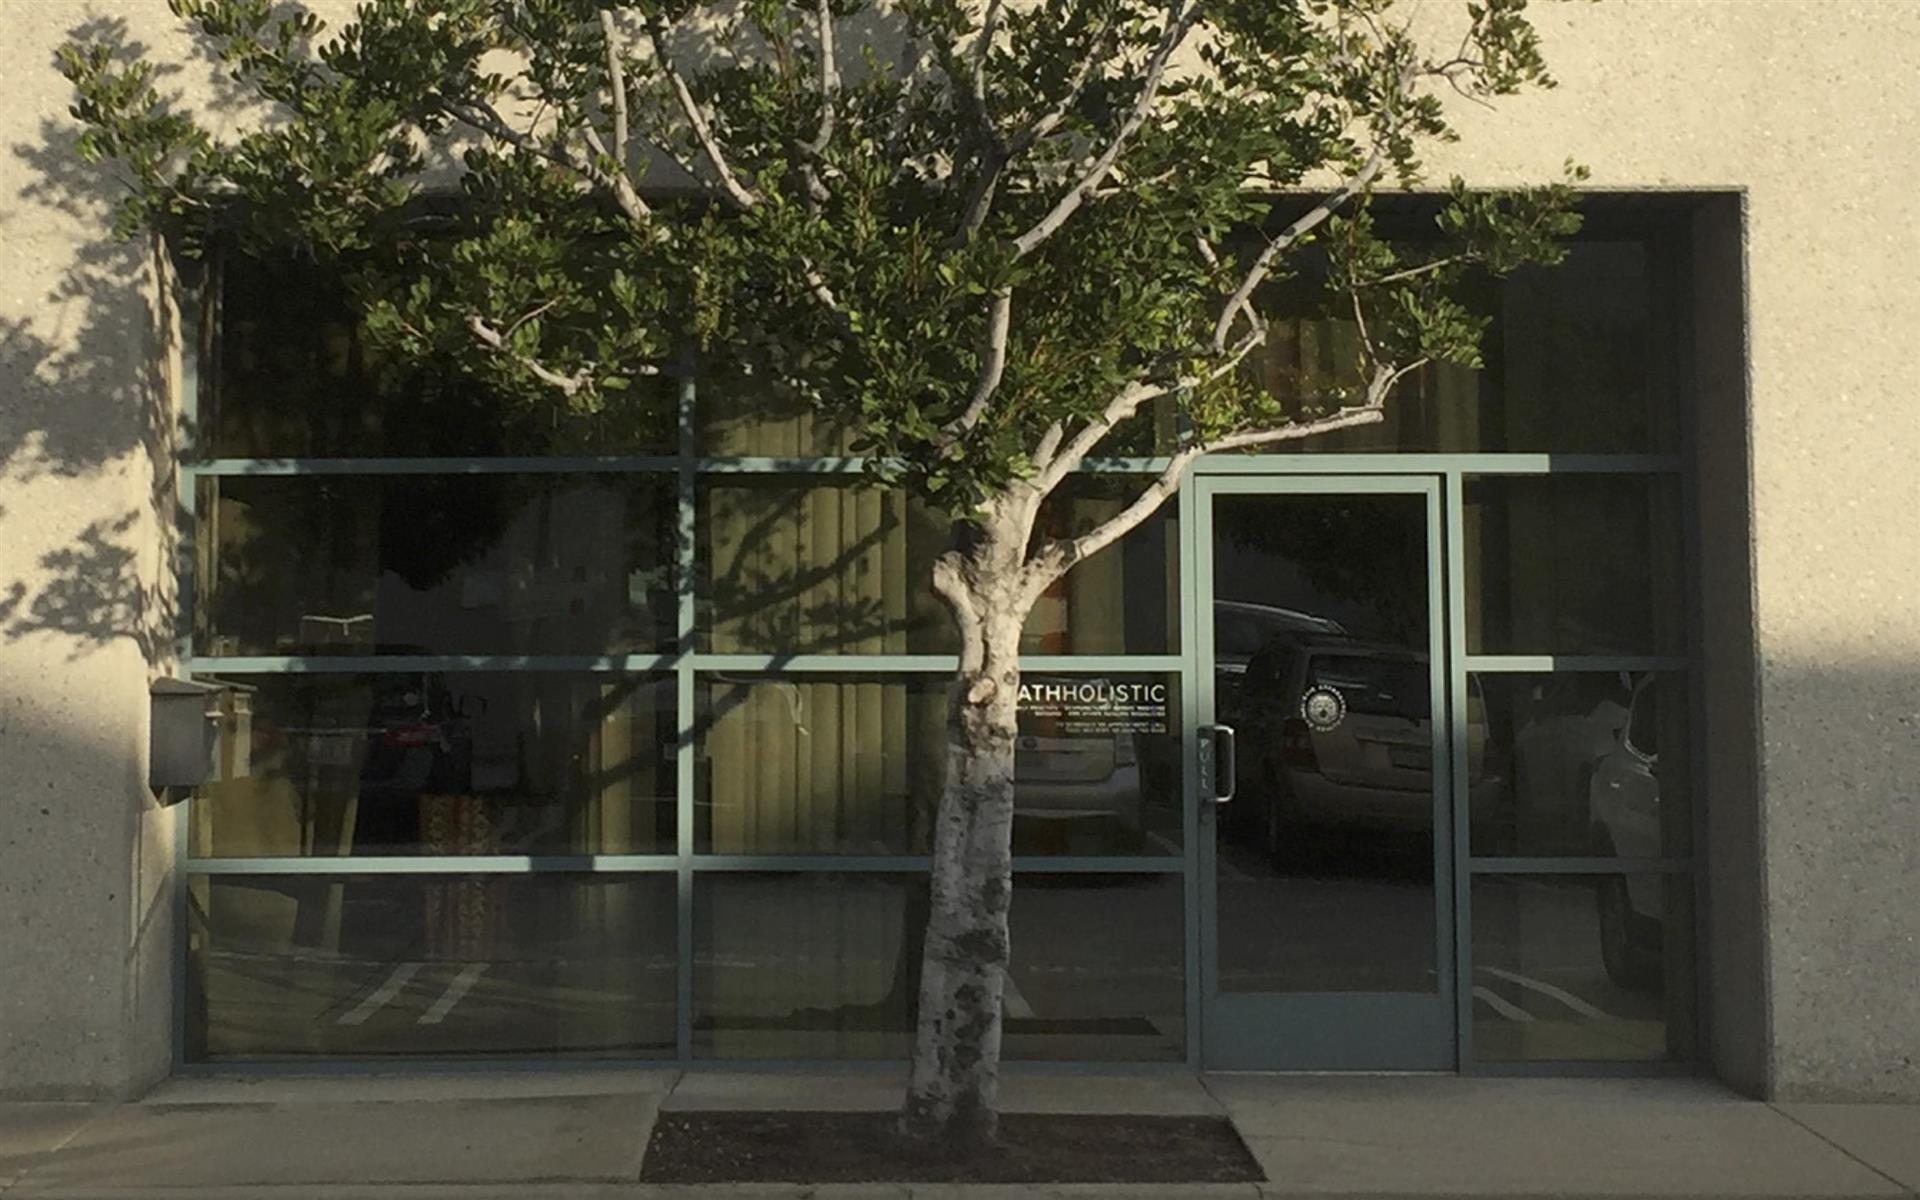 HATH Holistic - Wellness Center - Suite 1 (Hourly)